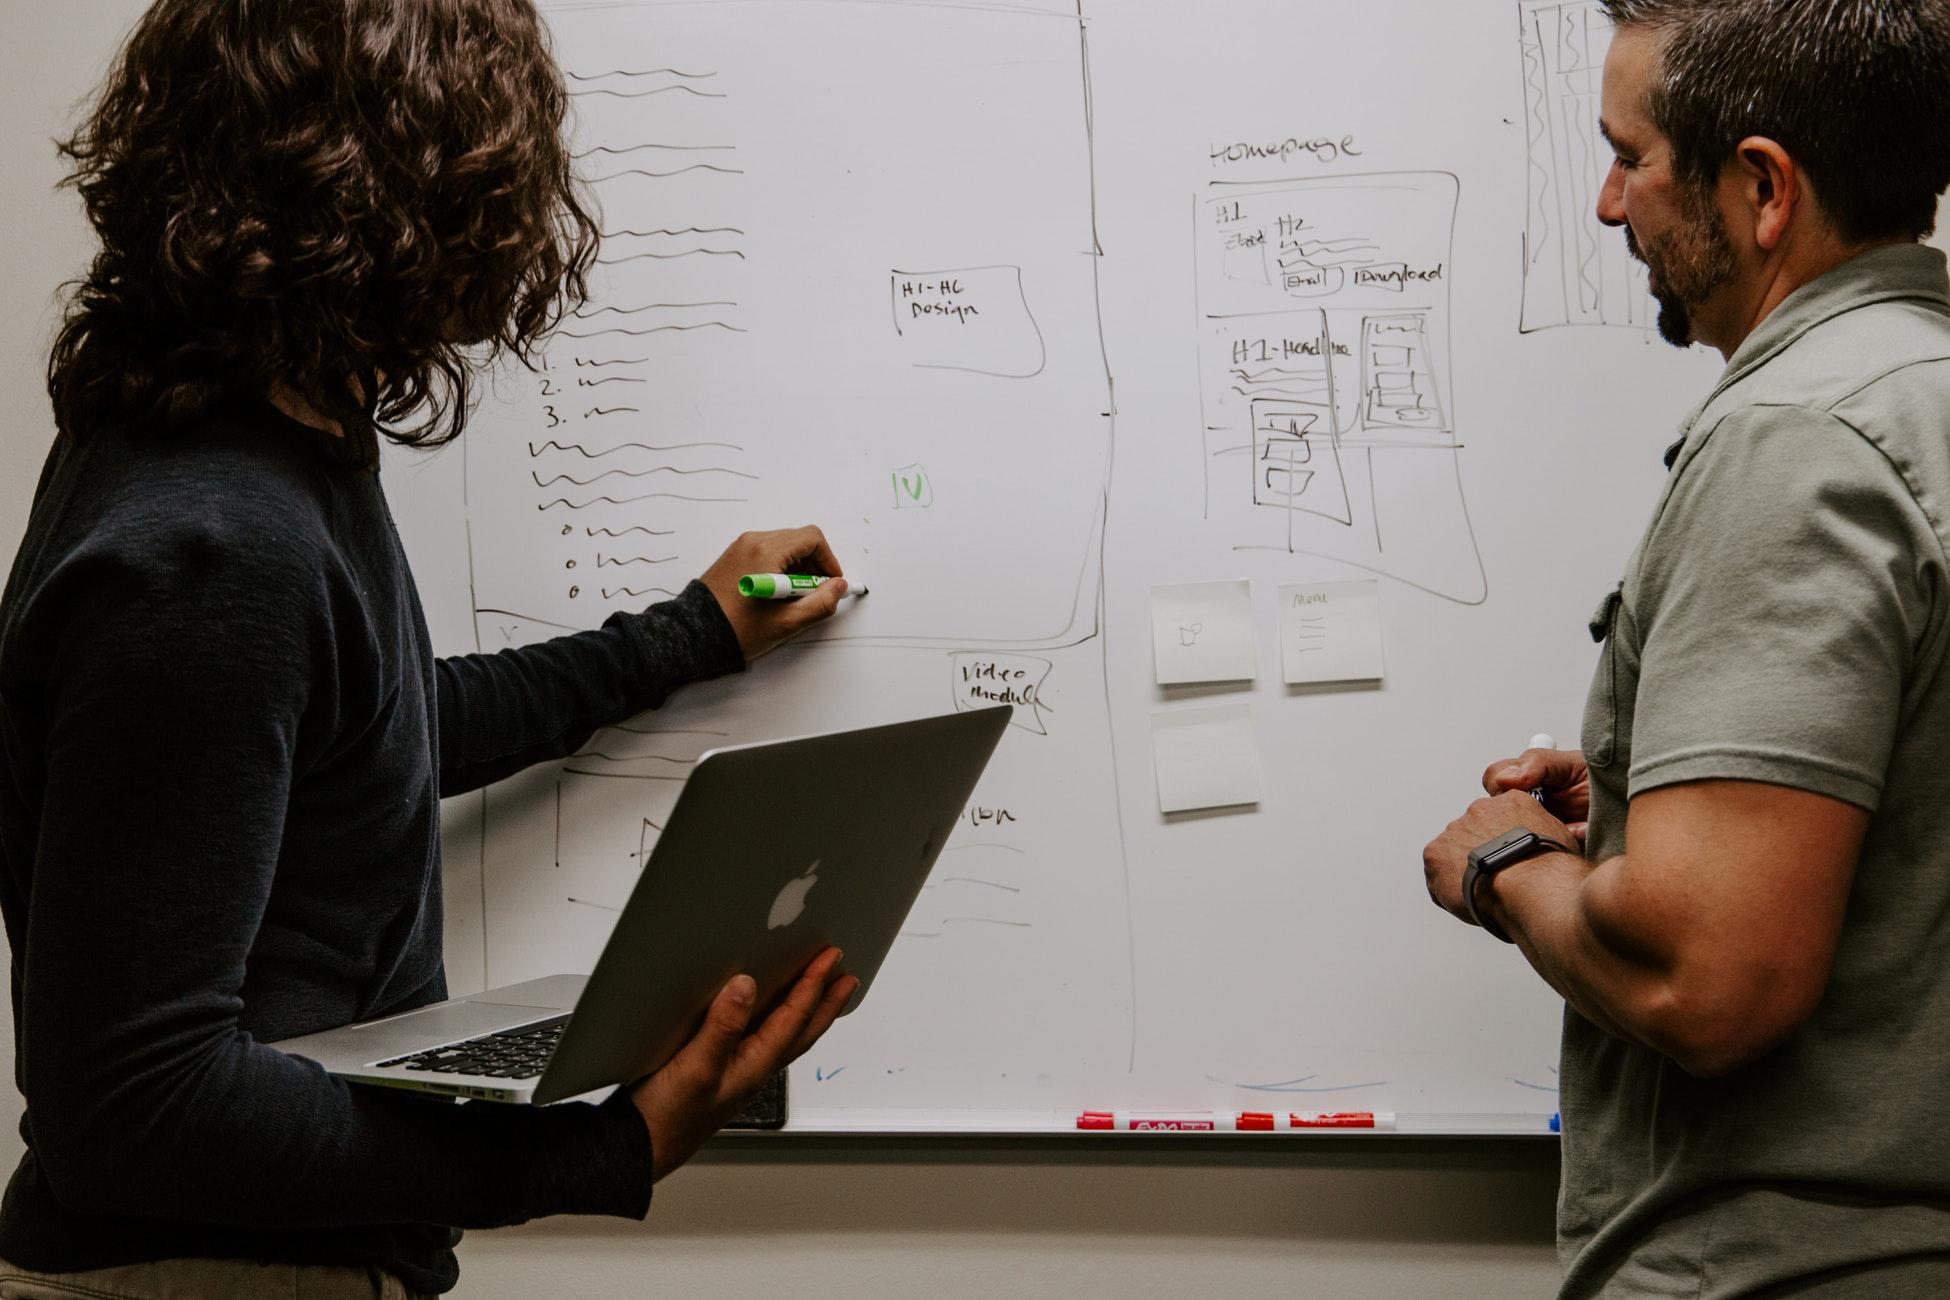 Digital project planning